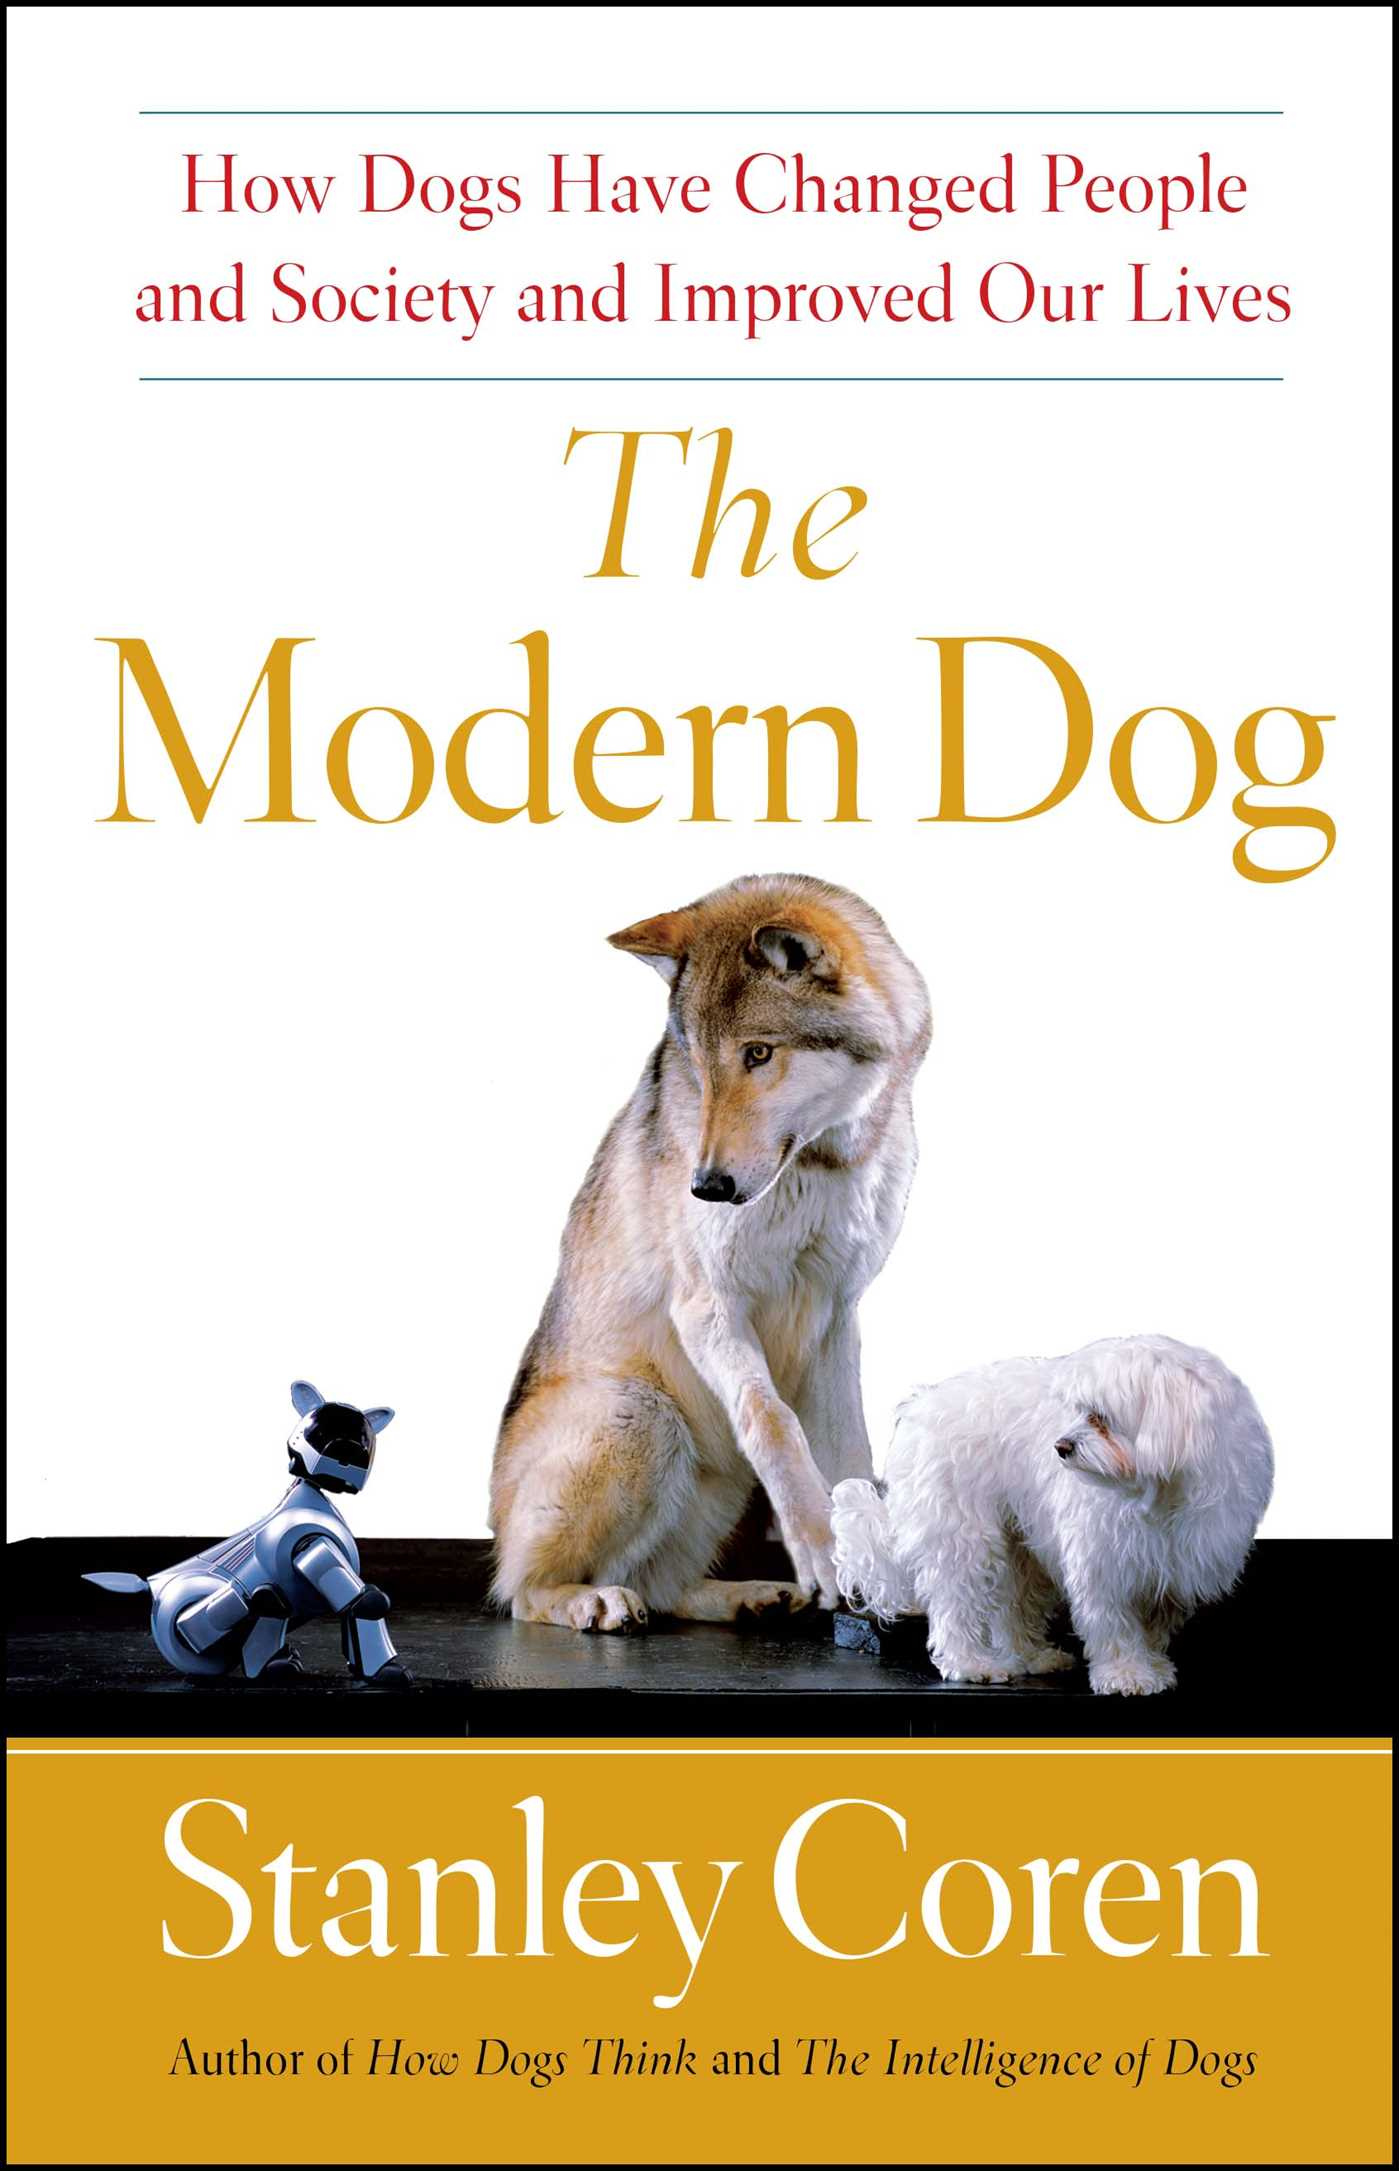 The modern dog 9781439152881 hr